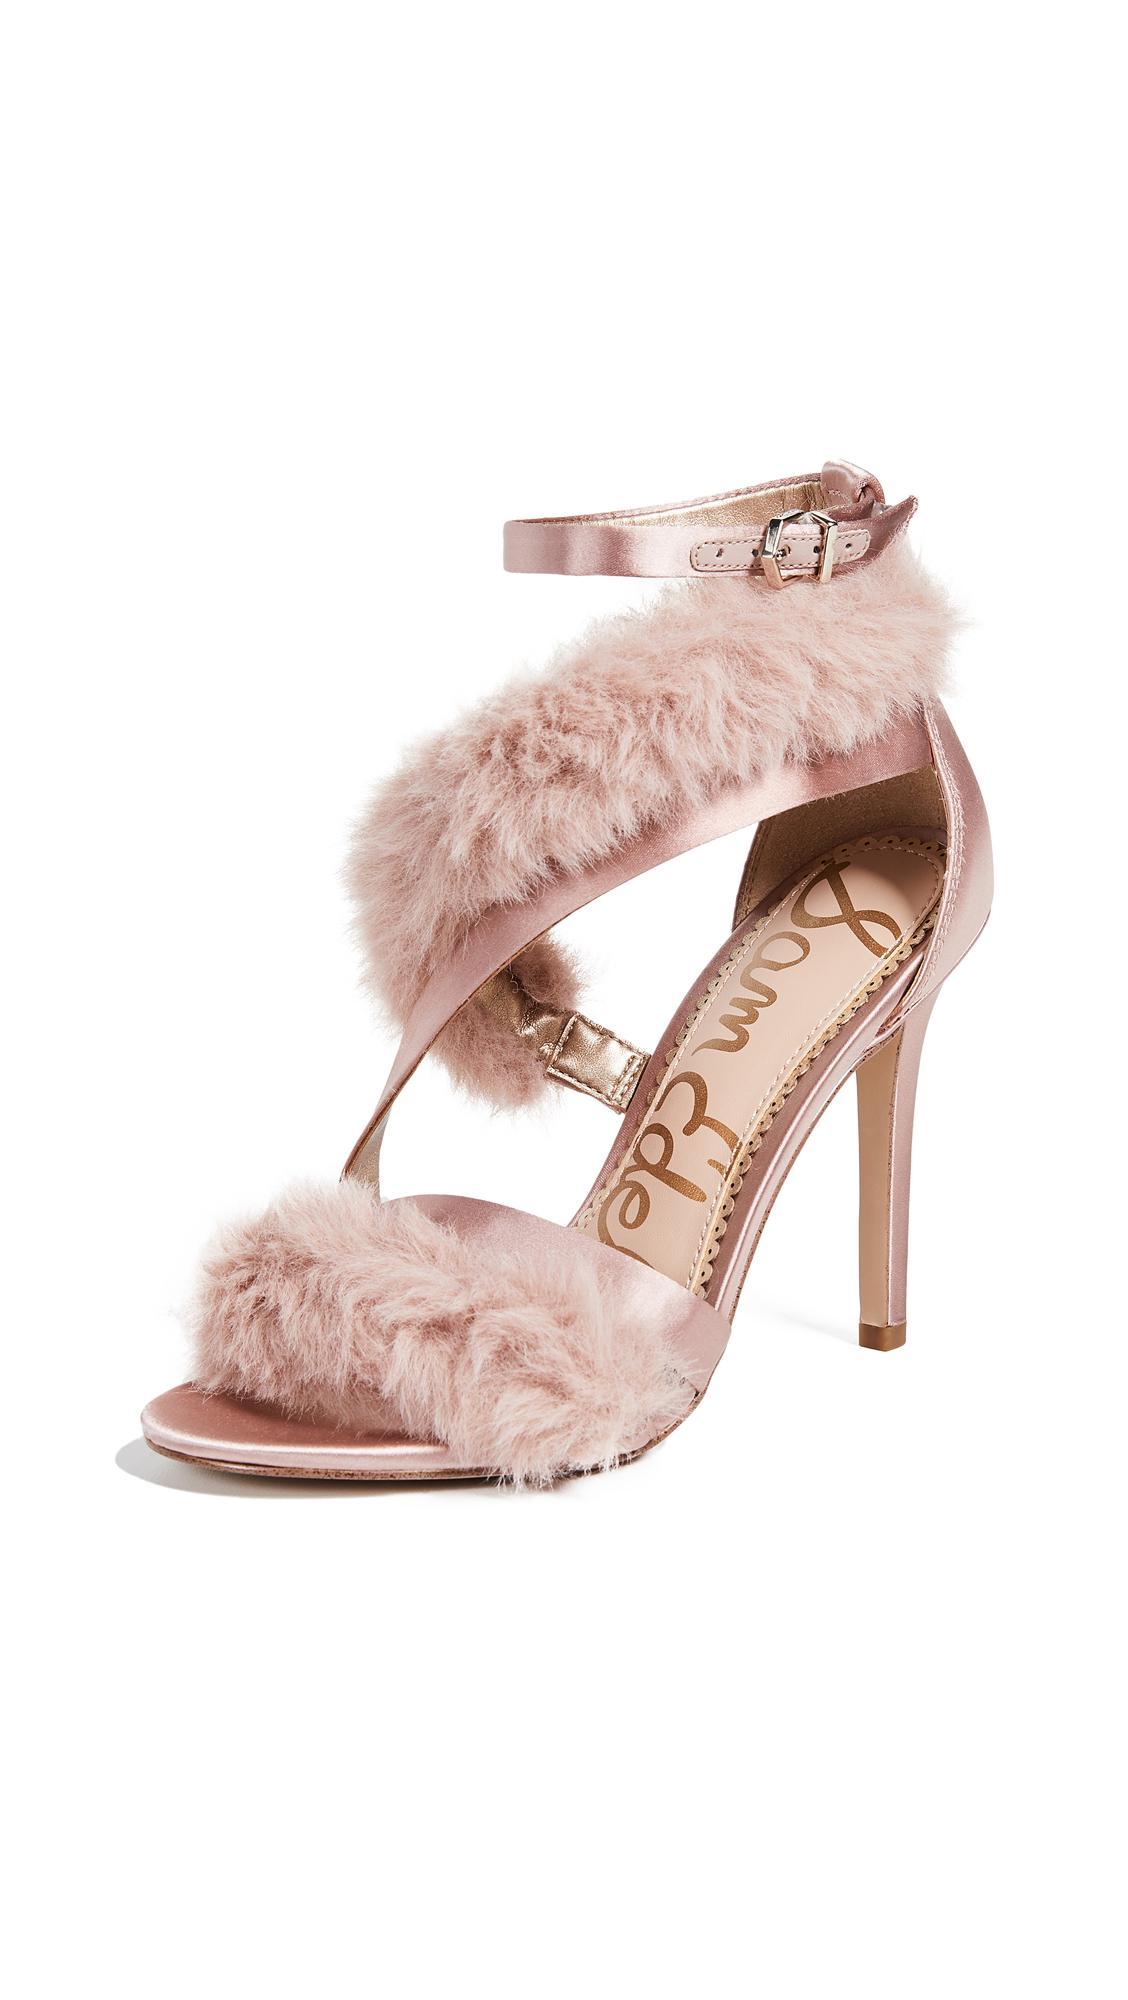 40801da4f2c2 Sam Edelman Adelle Satin And Faux-Fur Heeled Sandals In Crystal Pink ...